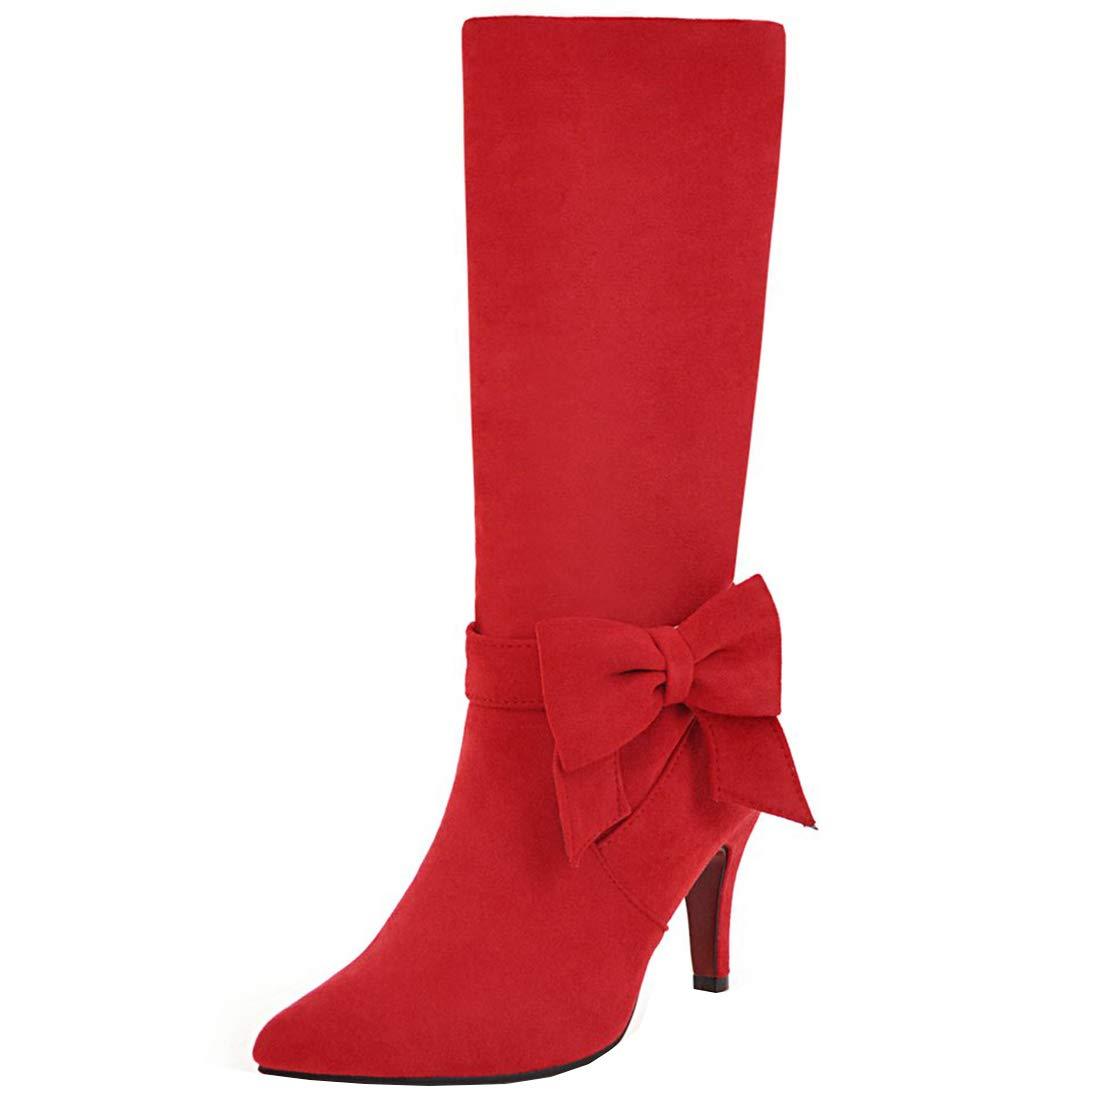 YE Chaussure Sweet Noeud Longue Bout Botte Botte Mi Mollet Stretch Fourrure Femme Bout Pointu Talon Haut Aiguille avec Noeud Rockabilly Rouge 0a0488c - reprogrammed.space